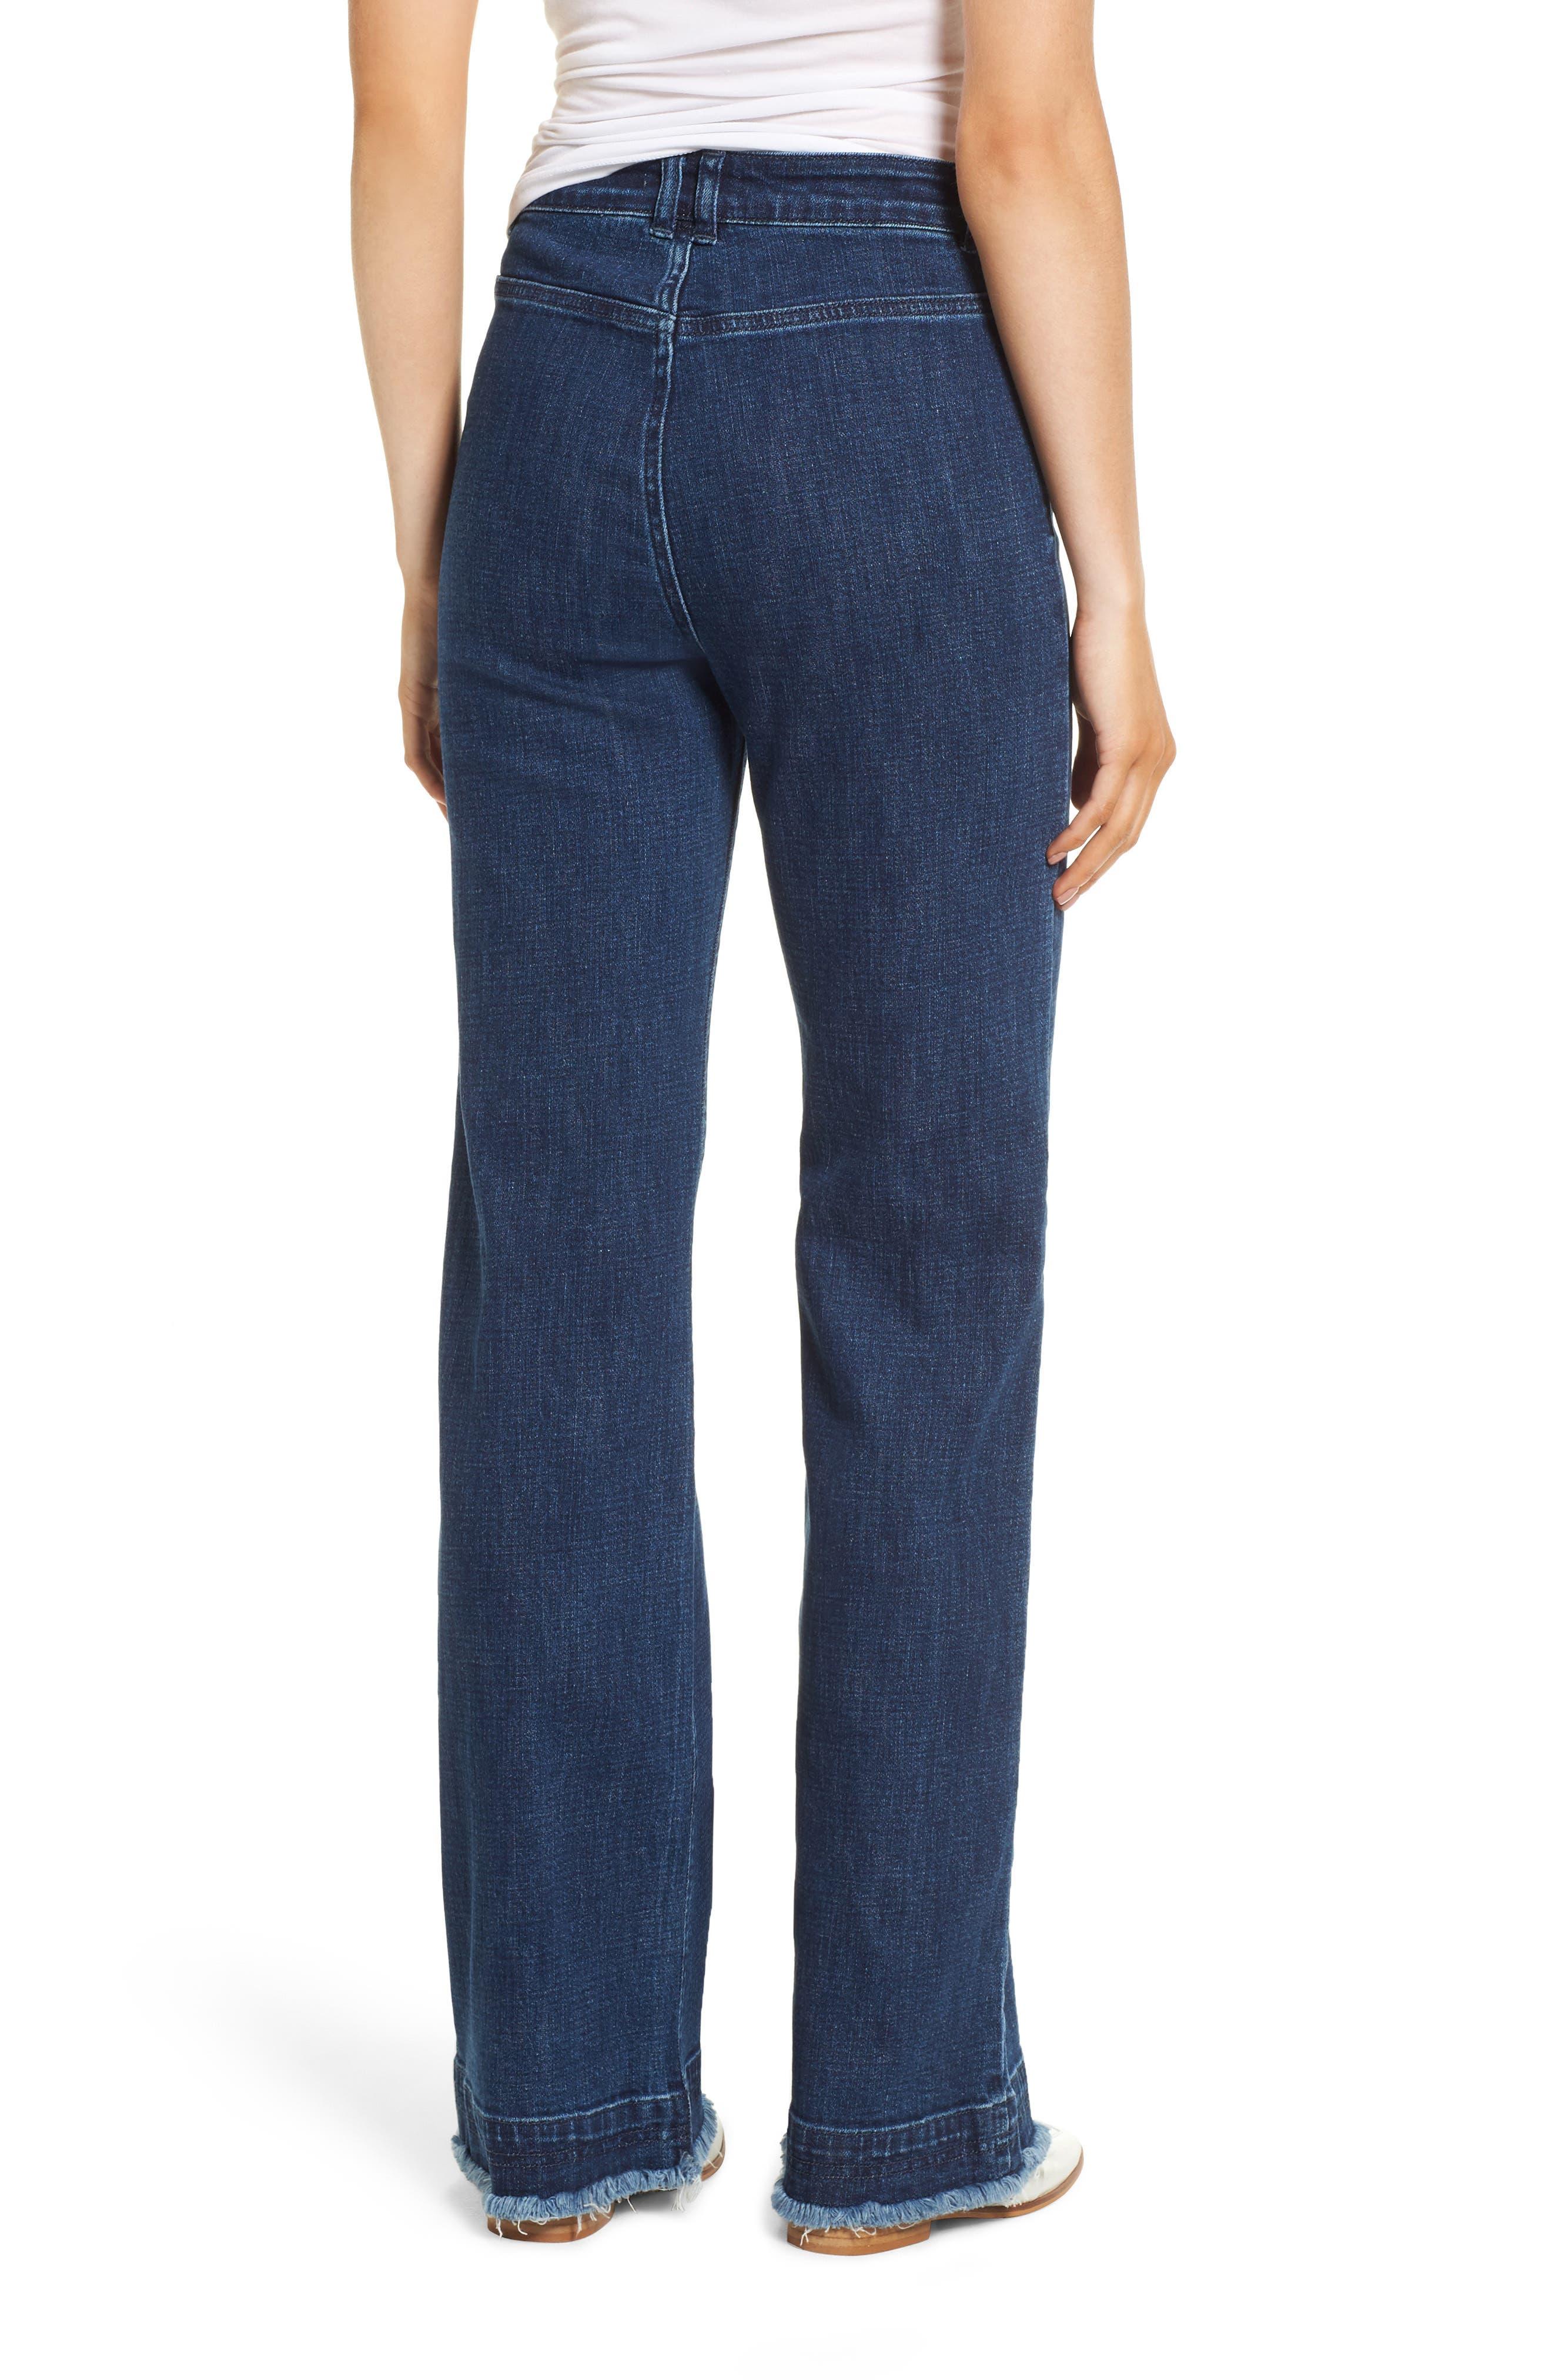 Elwood Wide Leg Jeans,                             Alternate thumbnail 2, color,                             INDIGO